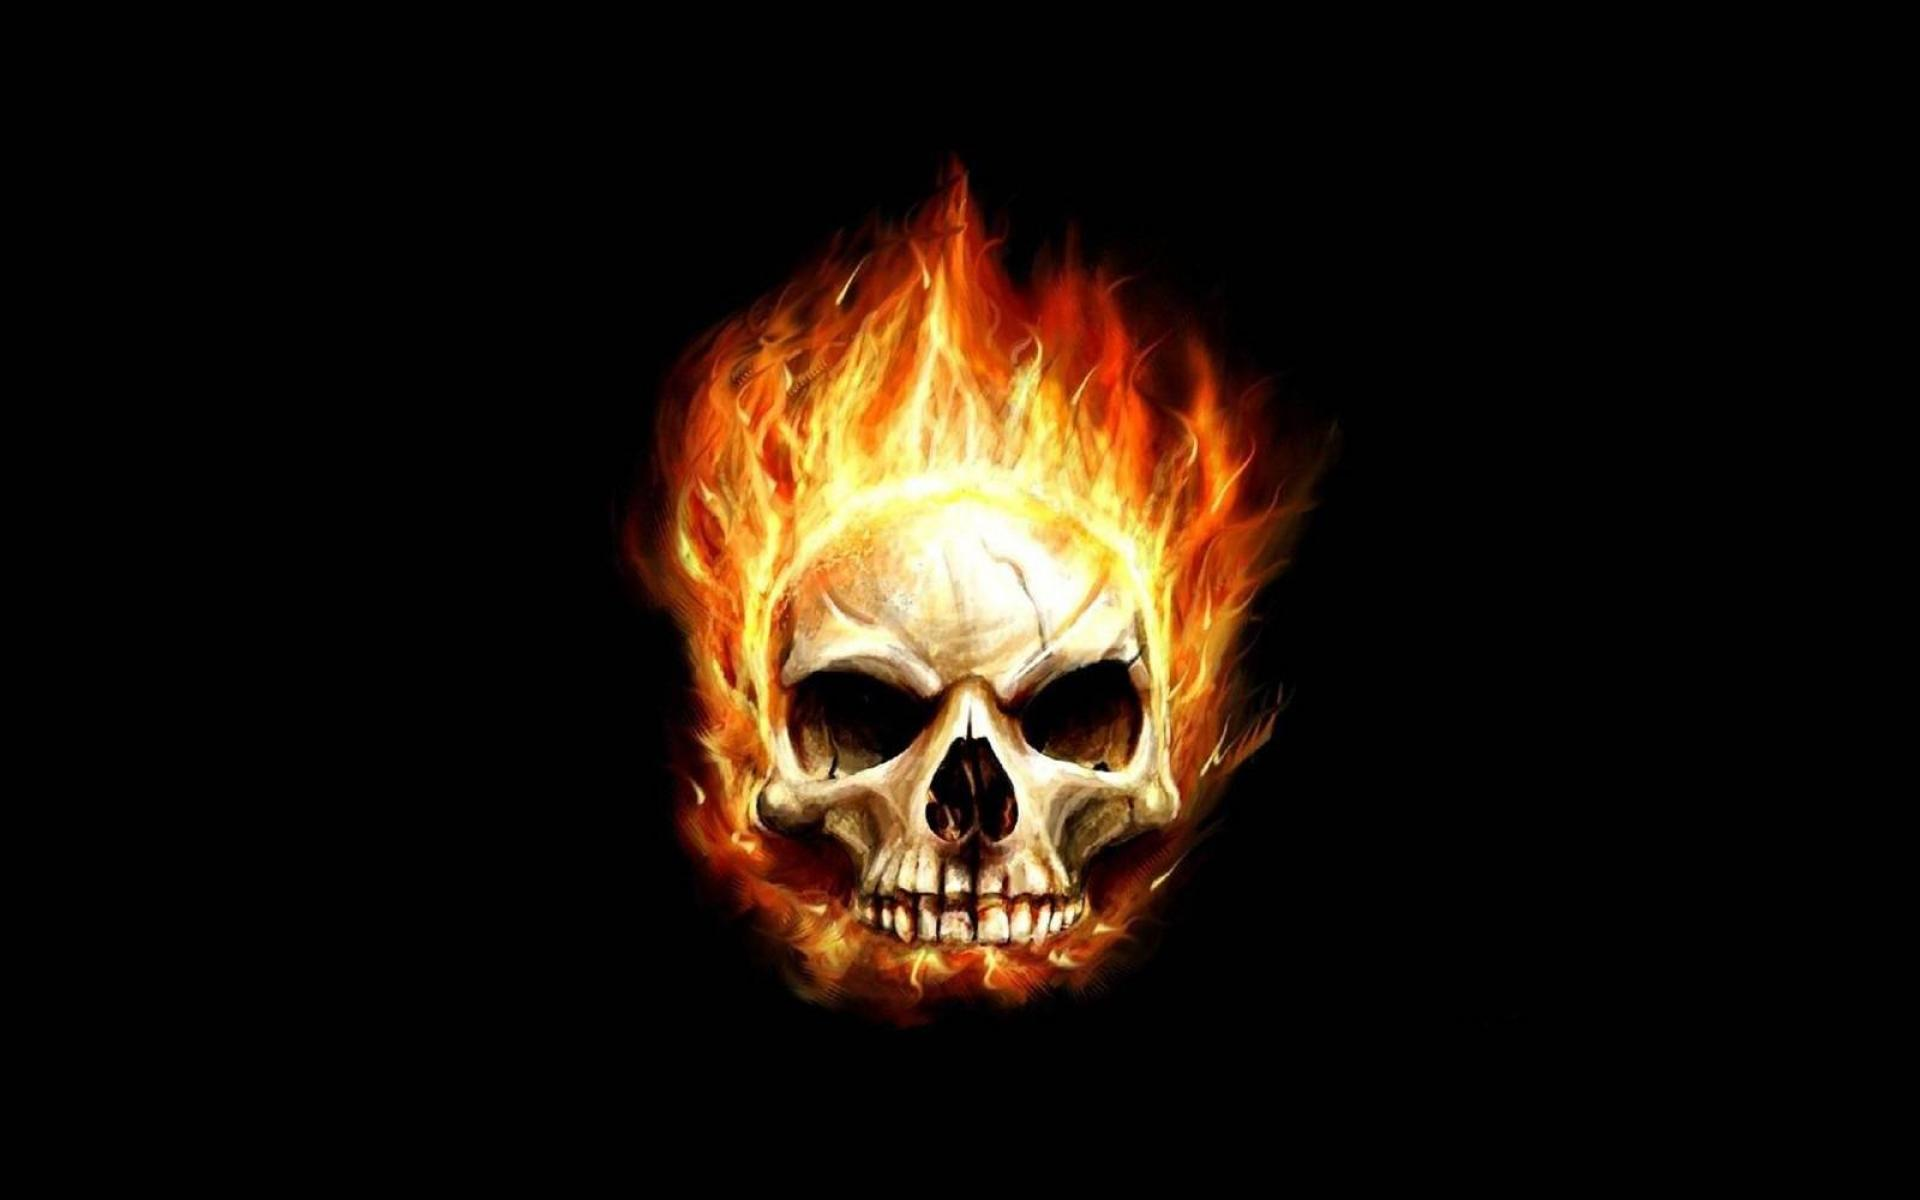 Fire Skulls Wallpapers - Wallpaper Cave